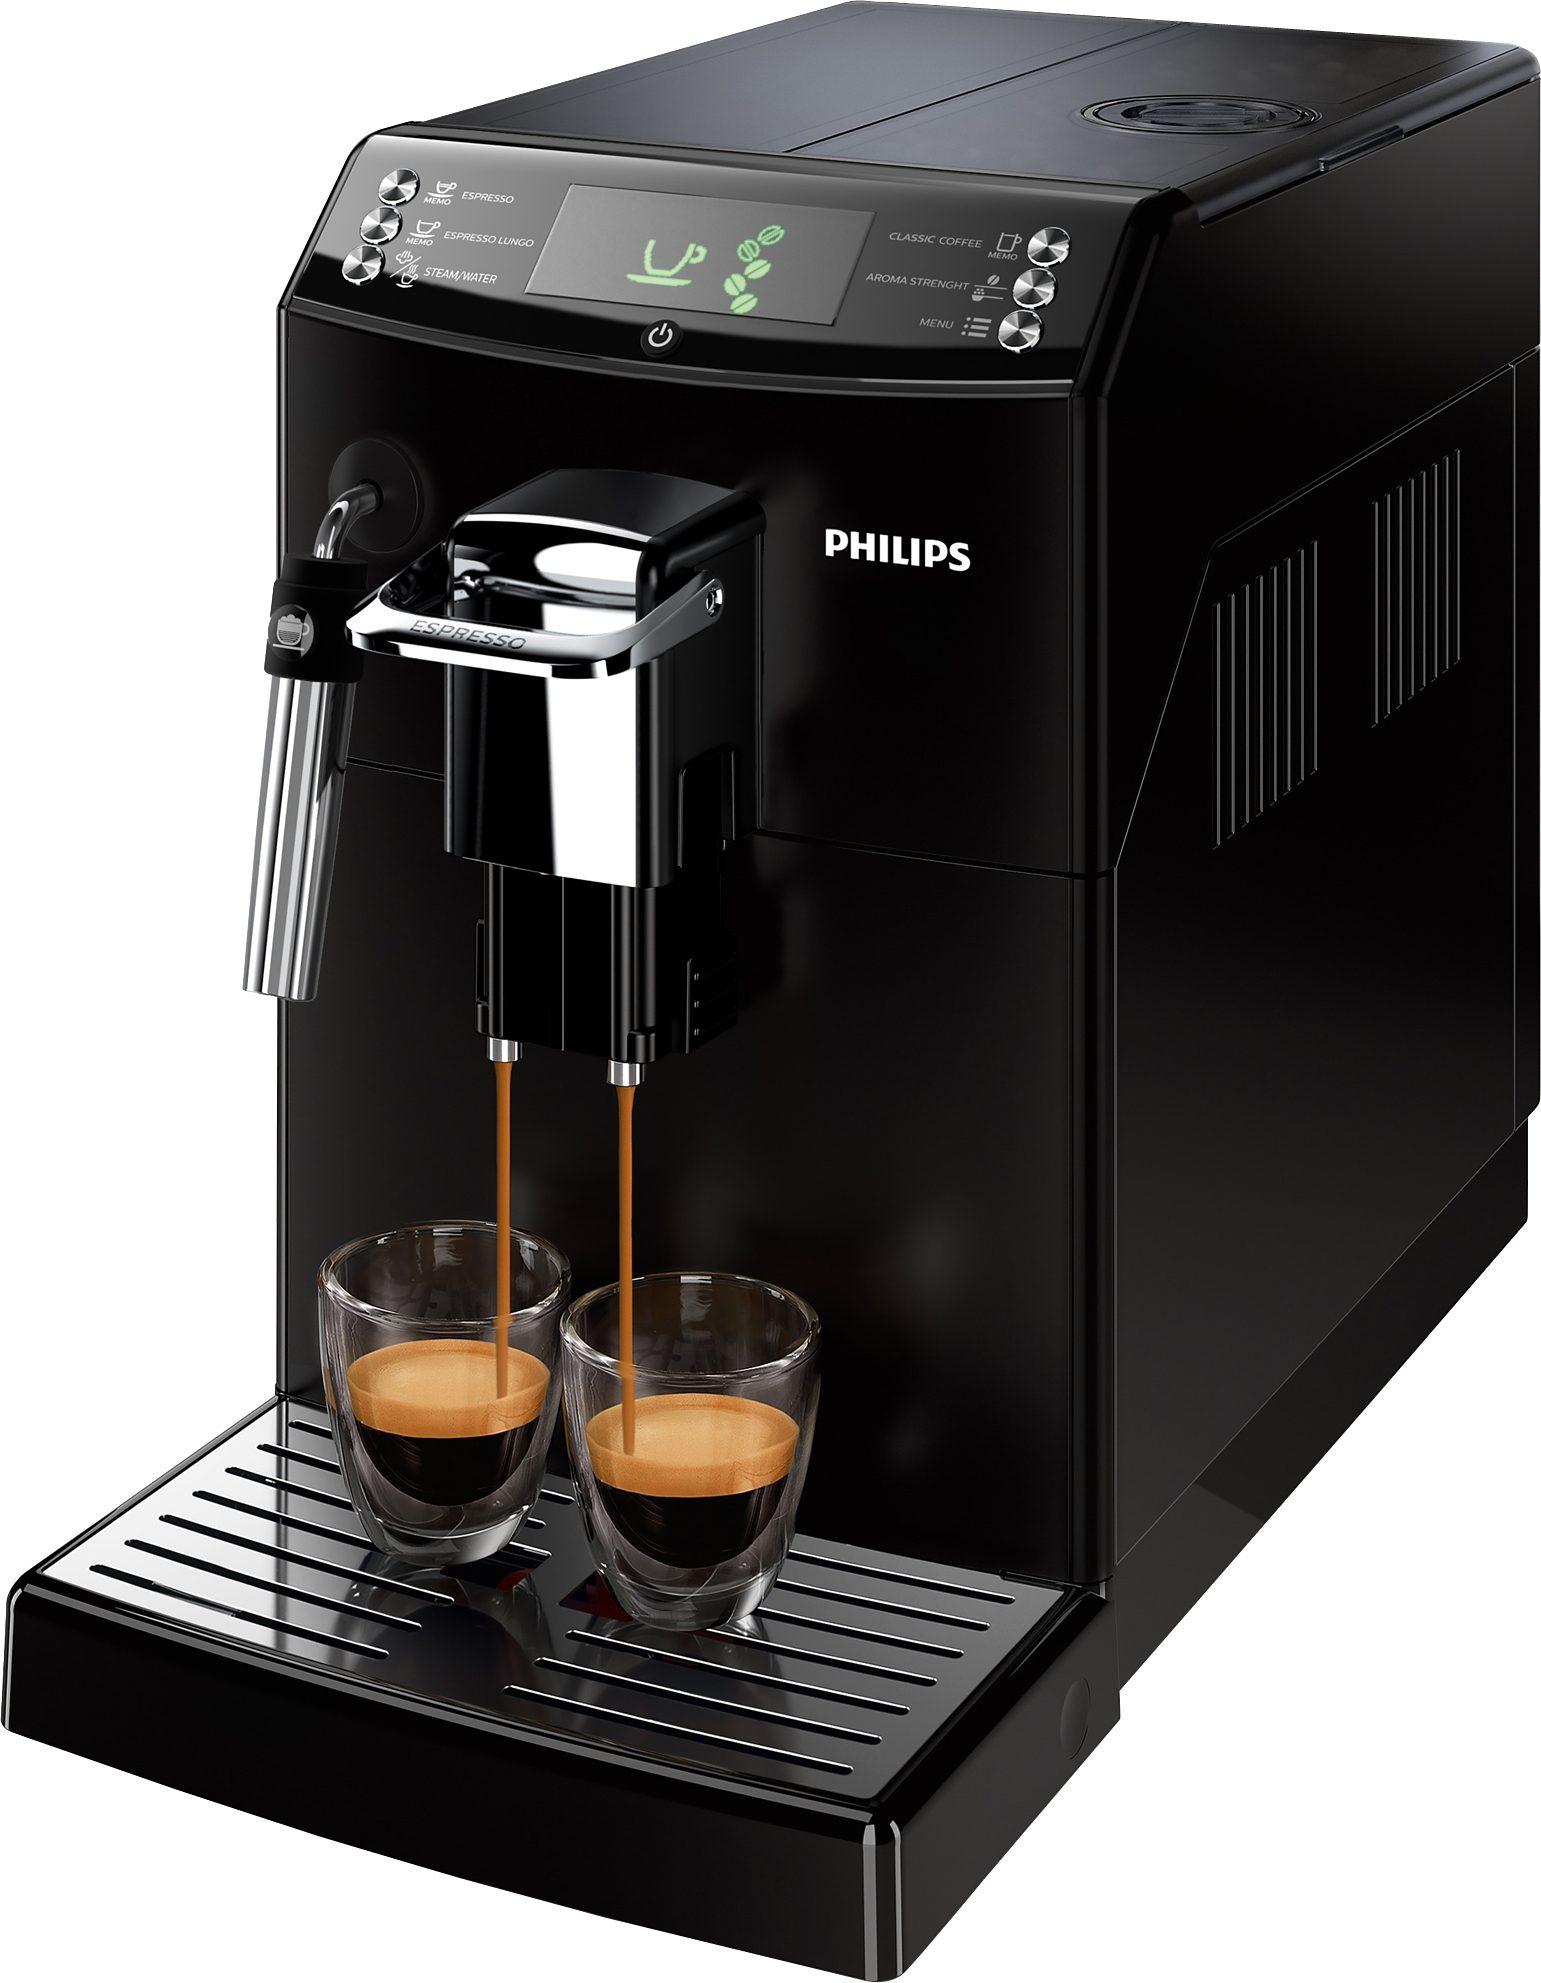 Philips Kaffeevollautomat 4000 Series HD8841/01, 1,8l Tank, Scheibenmahlwerk, mit Panarello